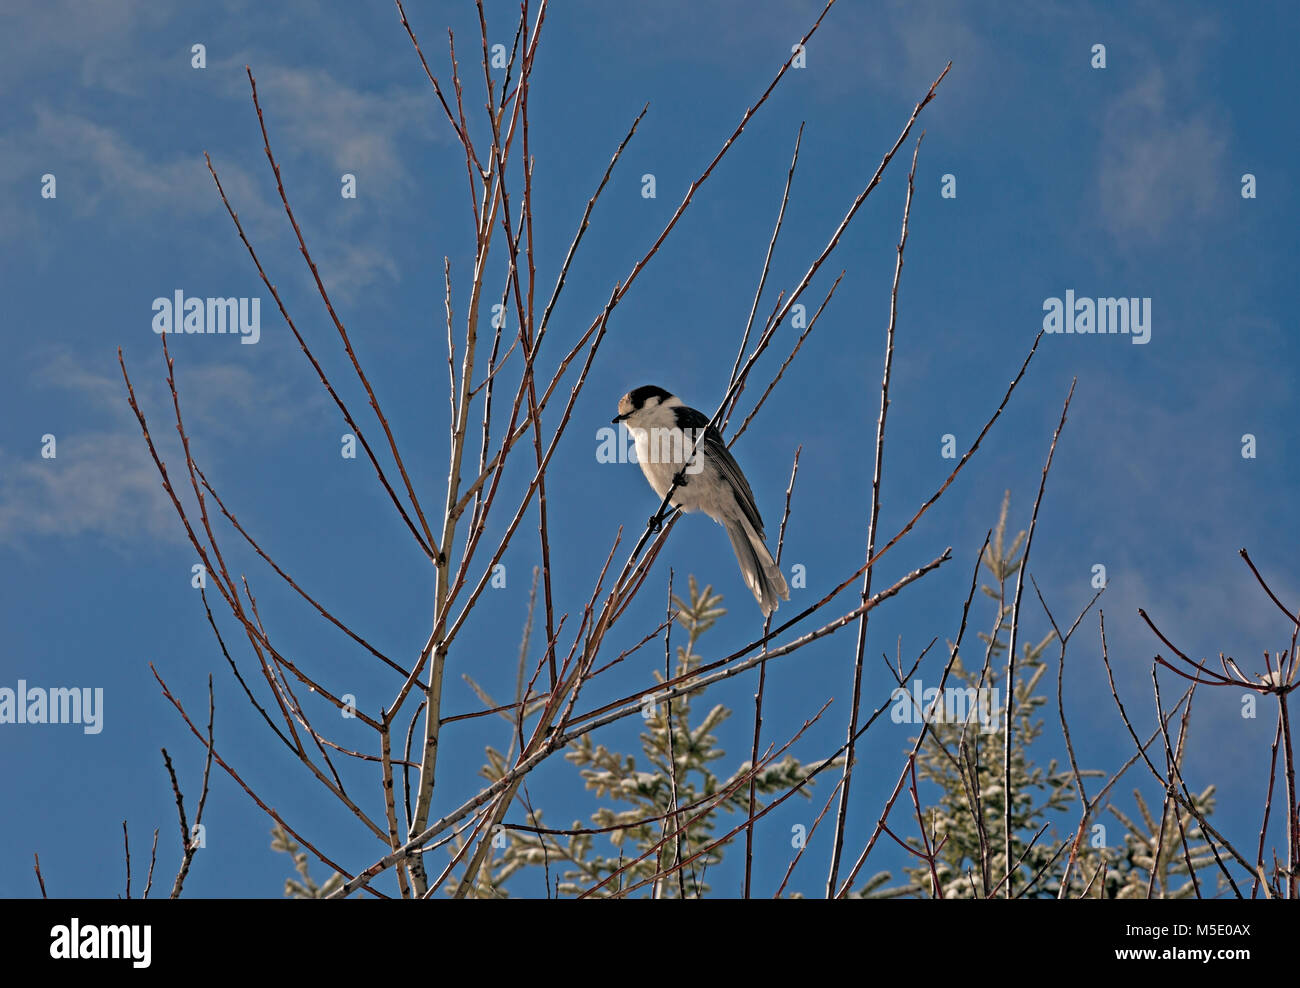 WA13592-00...WASHINGTON -  Camp robber (gray jay - Perisoreus canadensis)  waiting to grab food from some unsuspecting - Stock Image